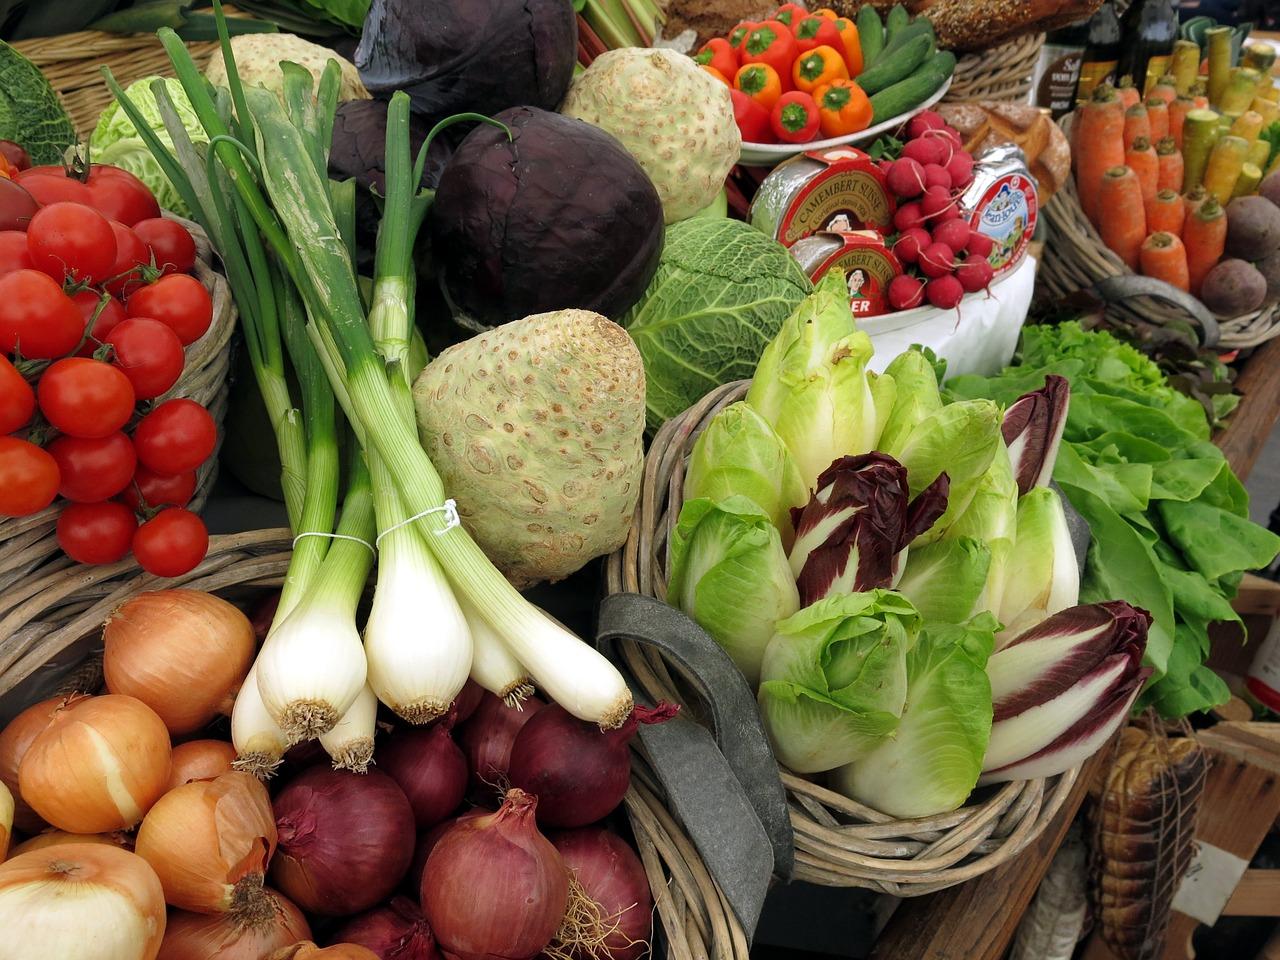 vegetables-1363031_1280.jpg